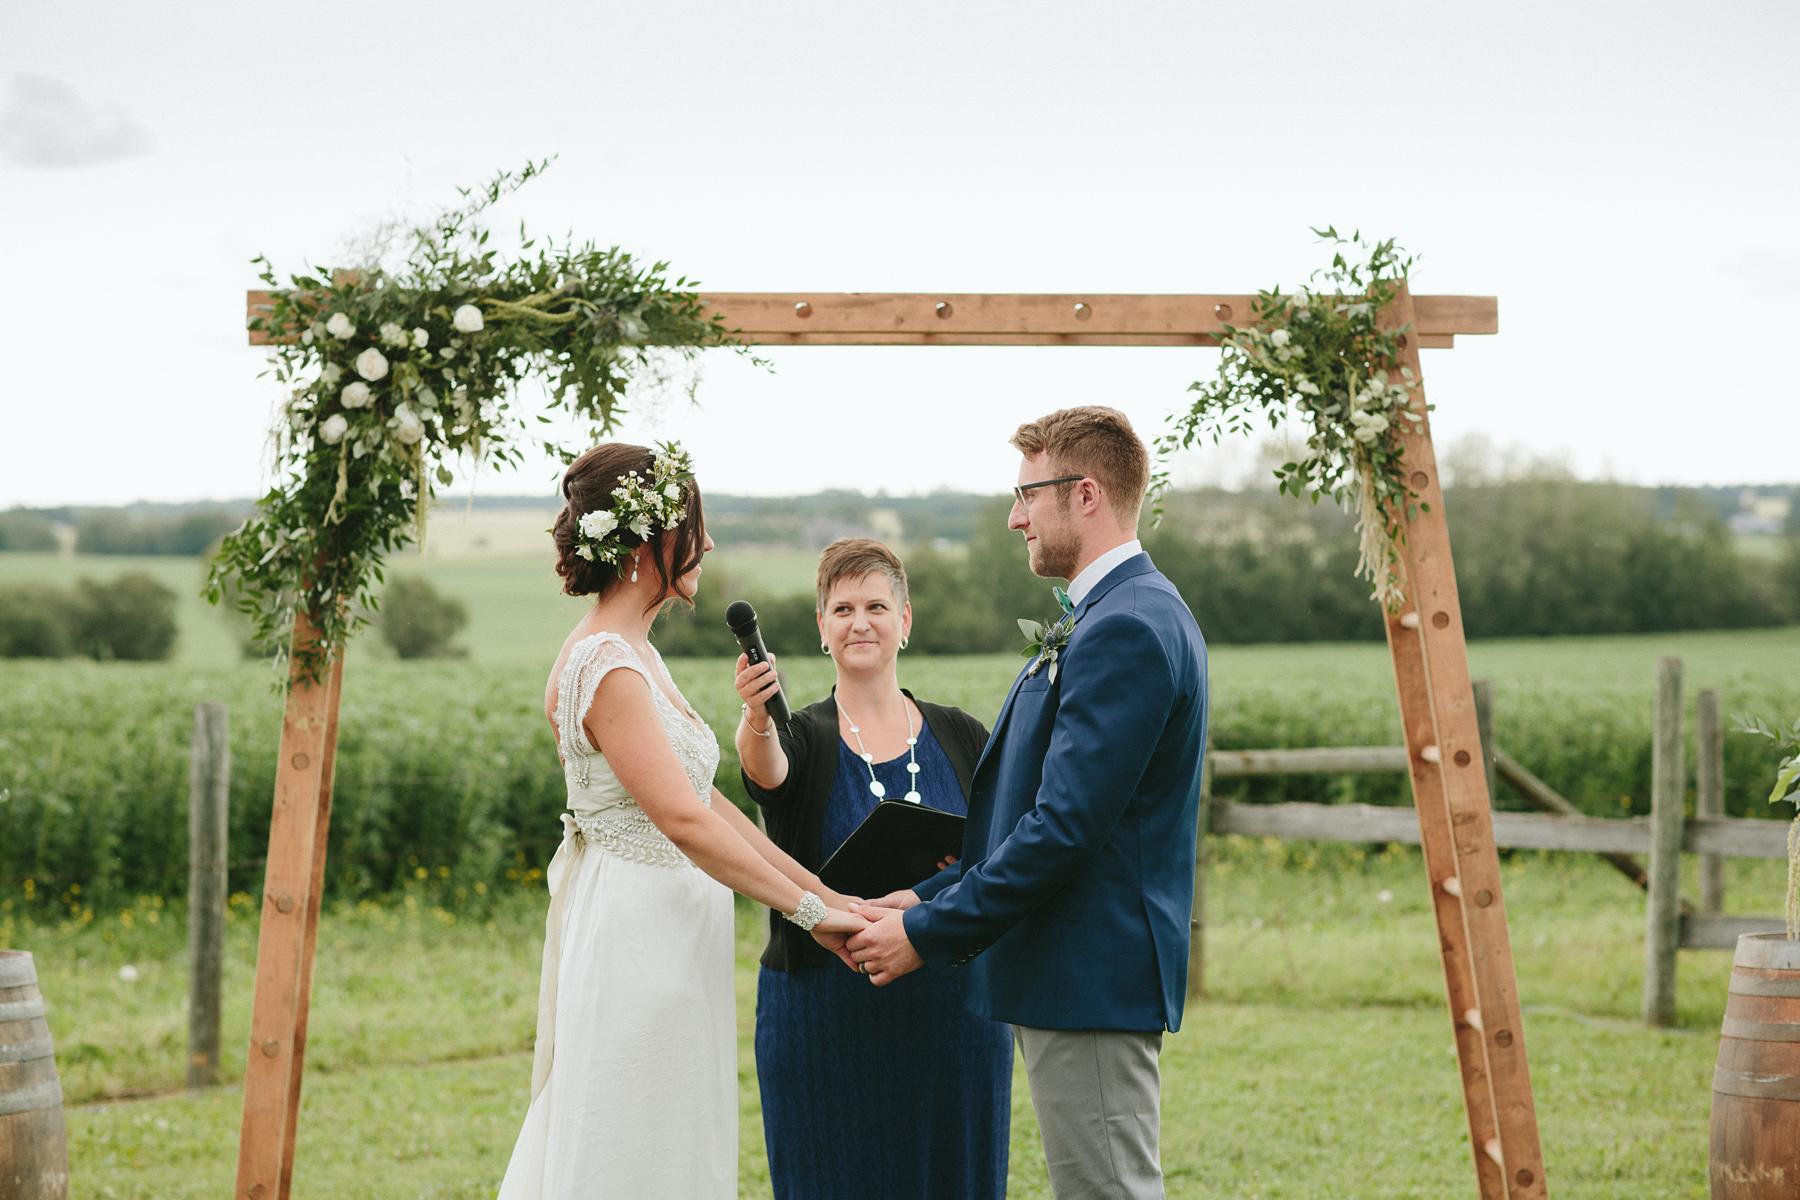 alberta-farm-wedding-photographer-rp-wj-140.jpg